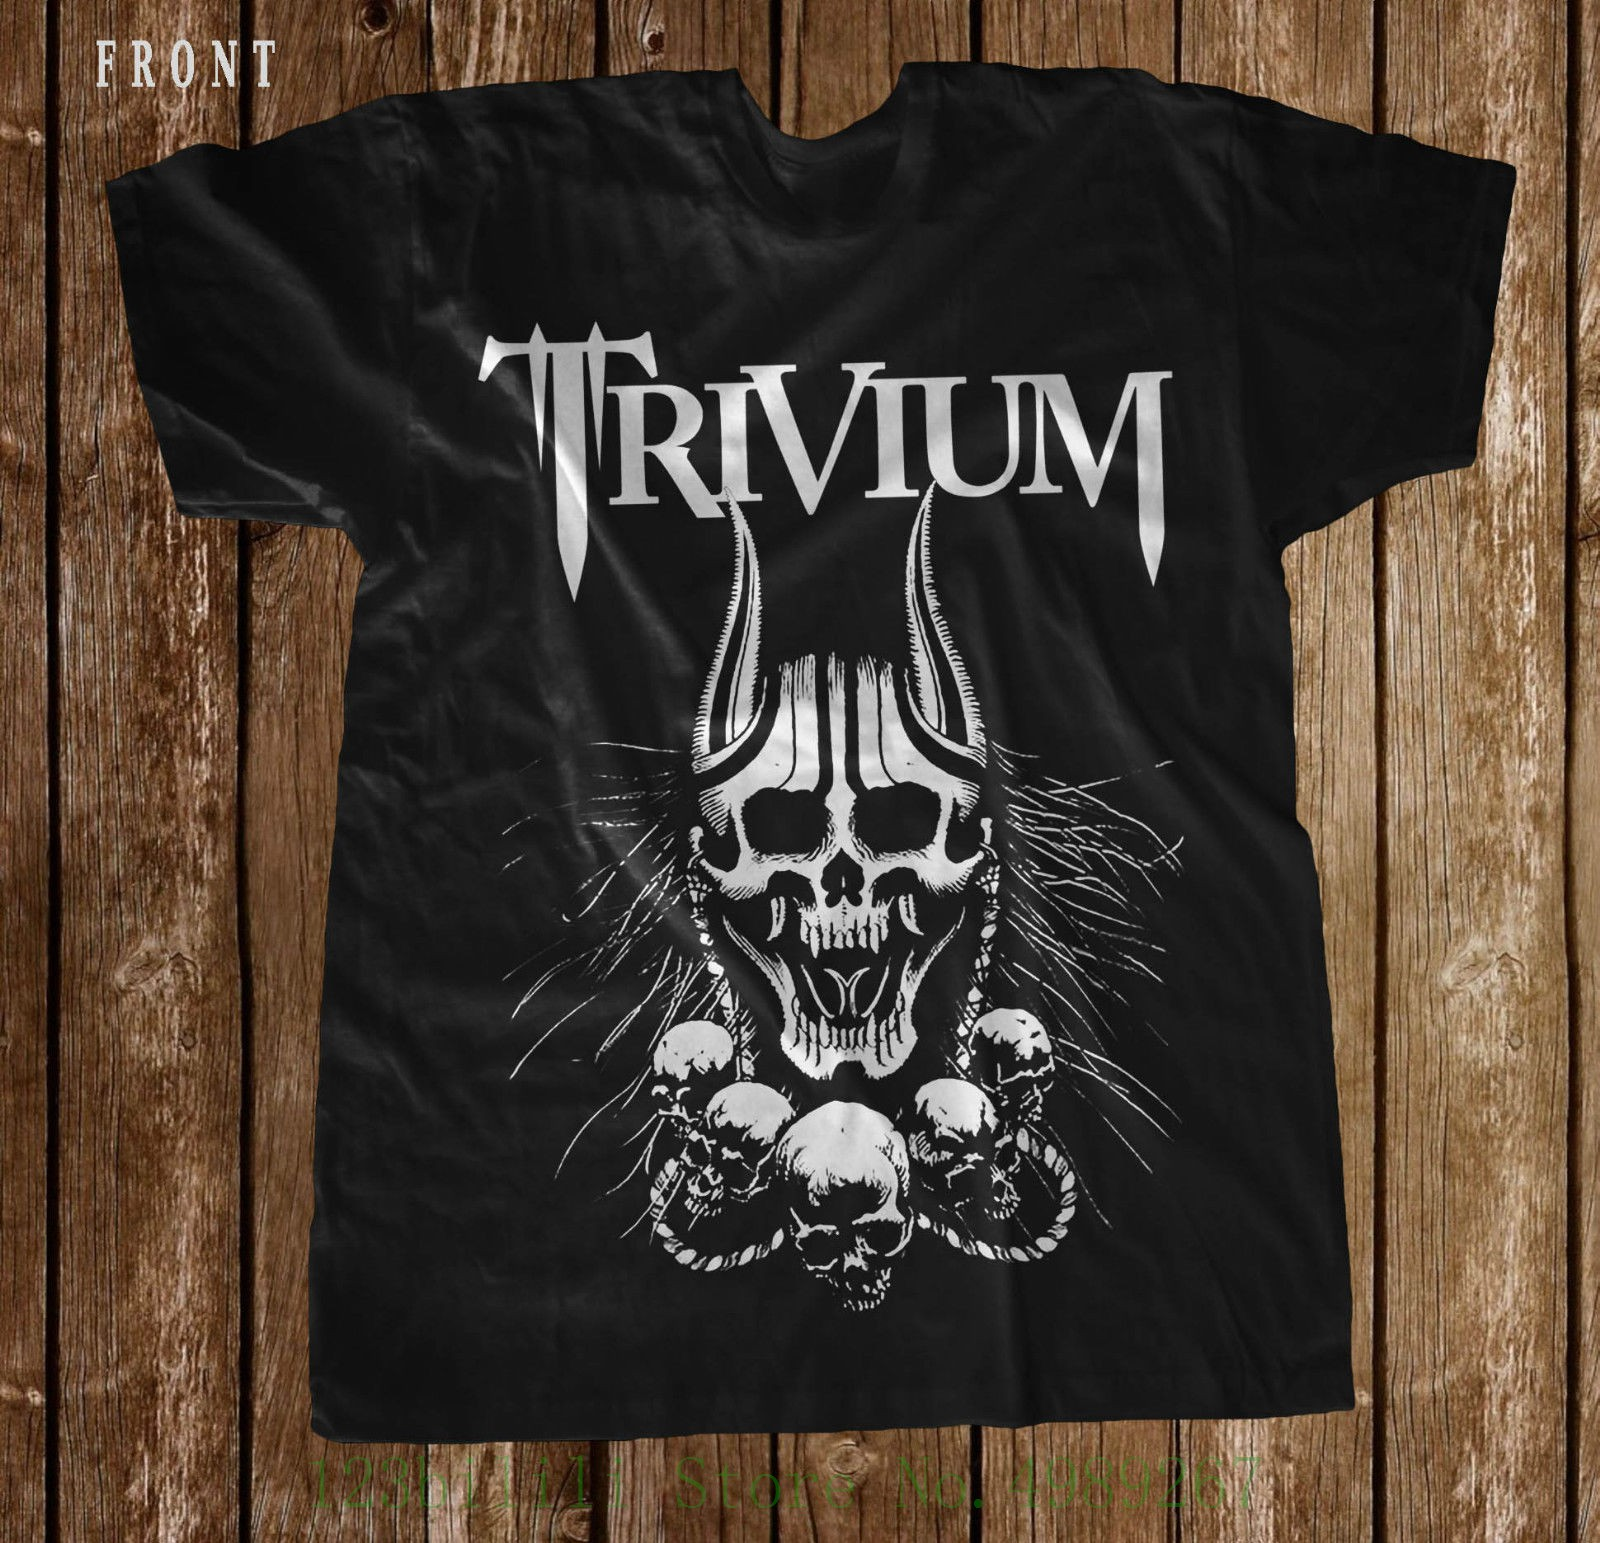 Trivium Silence In The Snow тяжелый металл тревога футболка Размеры: от S до 7xl Мужская Летняя